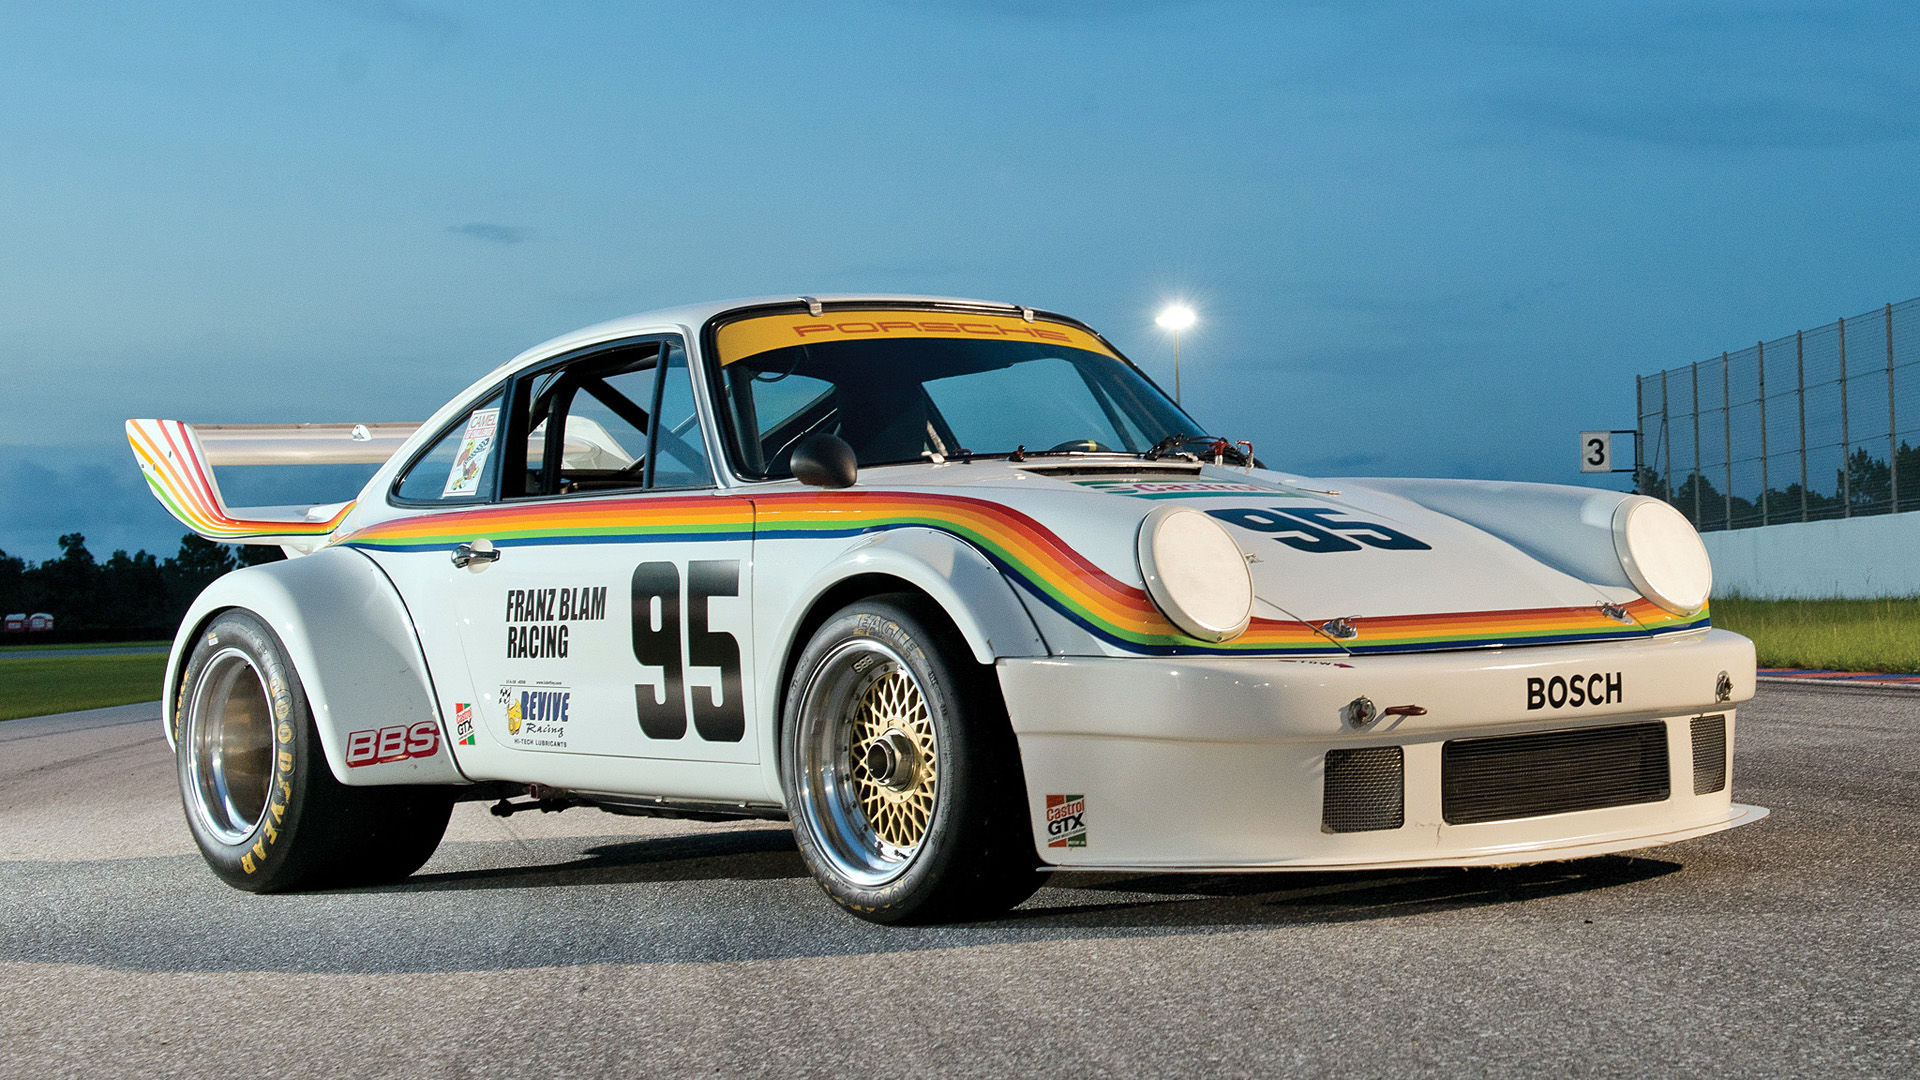 1977 Porsche 934 Turbo RSR